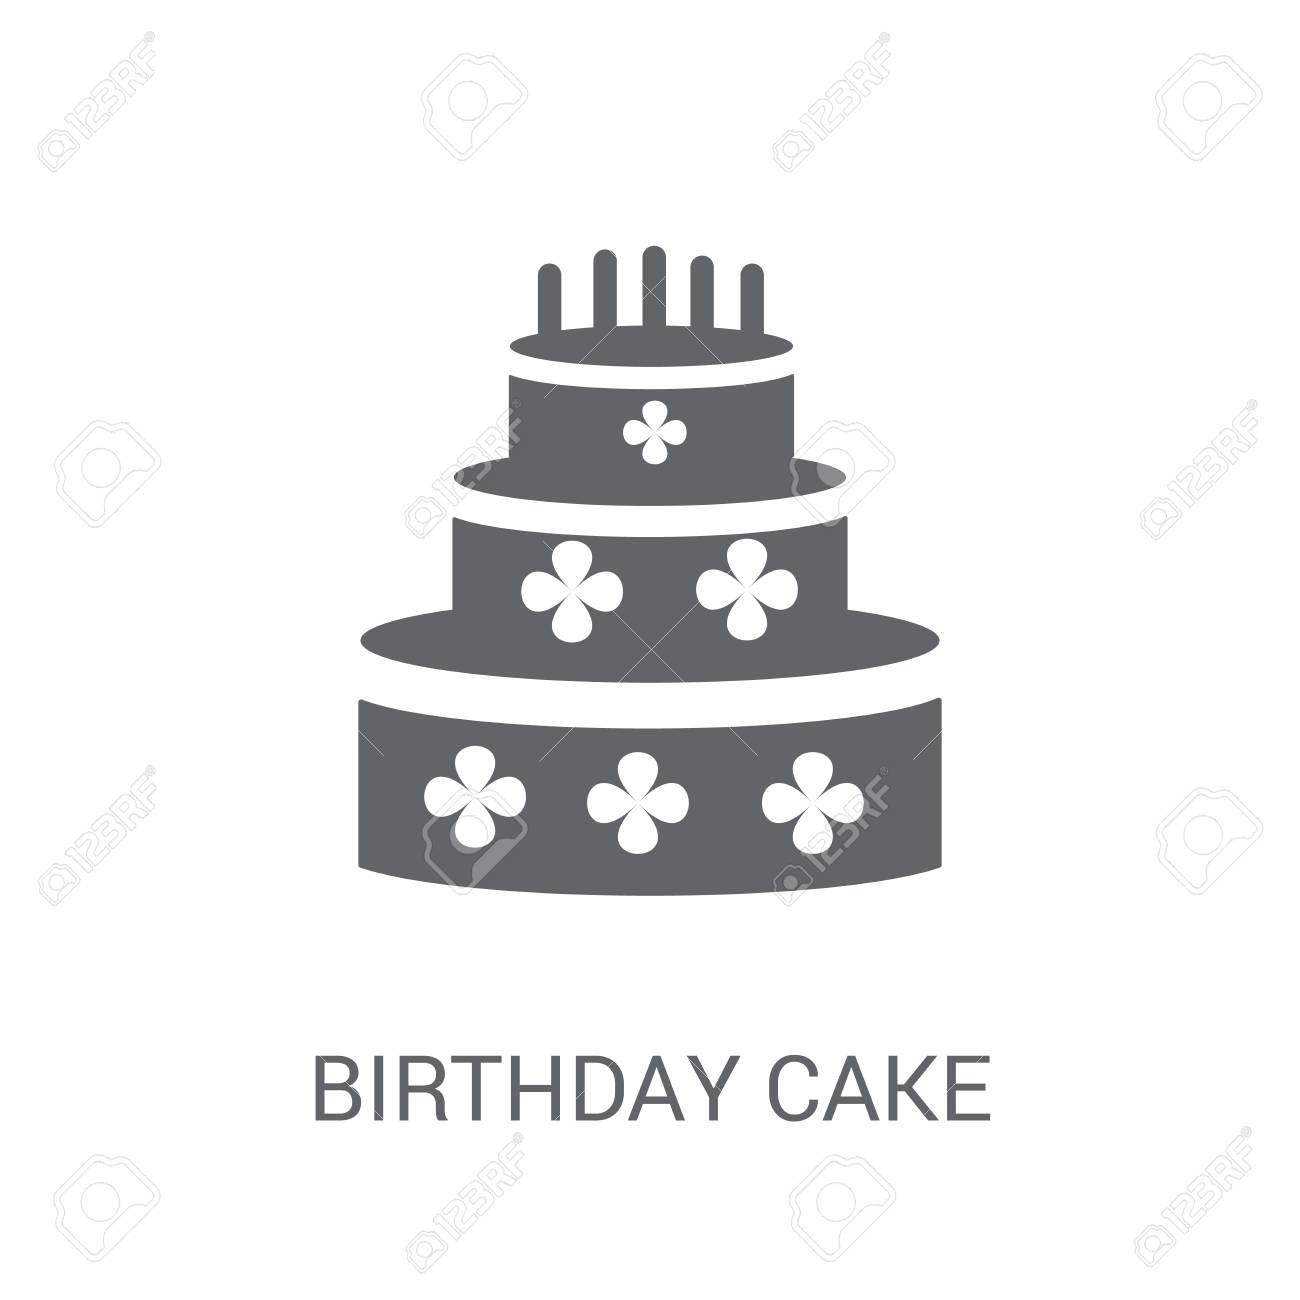 Birthday Cake Icon Trendy Birthday Cake Logo Concept On White